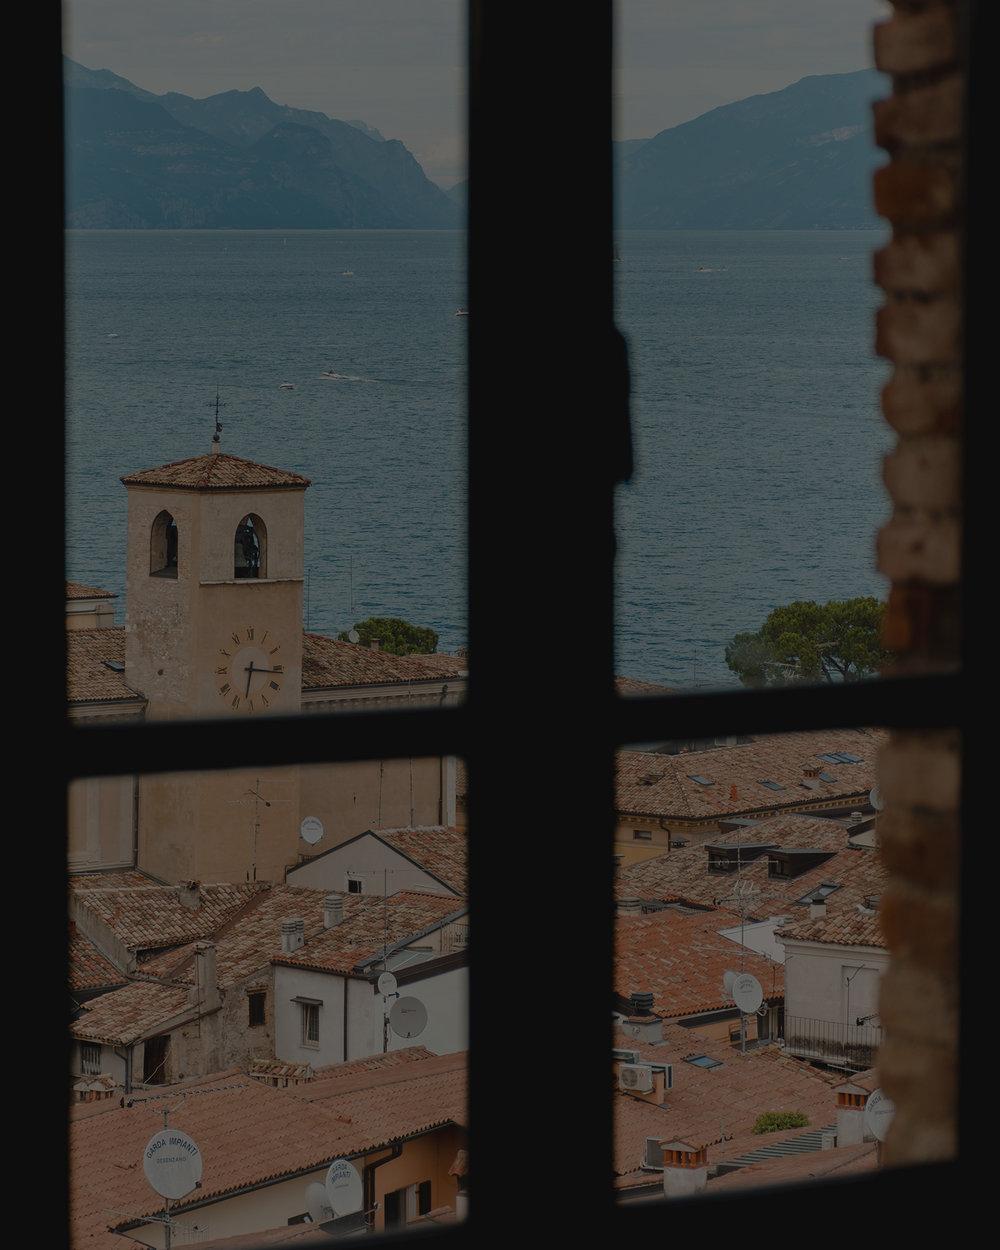 SOLD OUT!!!ITALY~LOMBARDY: MILAN, LAKE COMO, FRANCIACORTA, & LAKE GARDA -